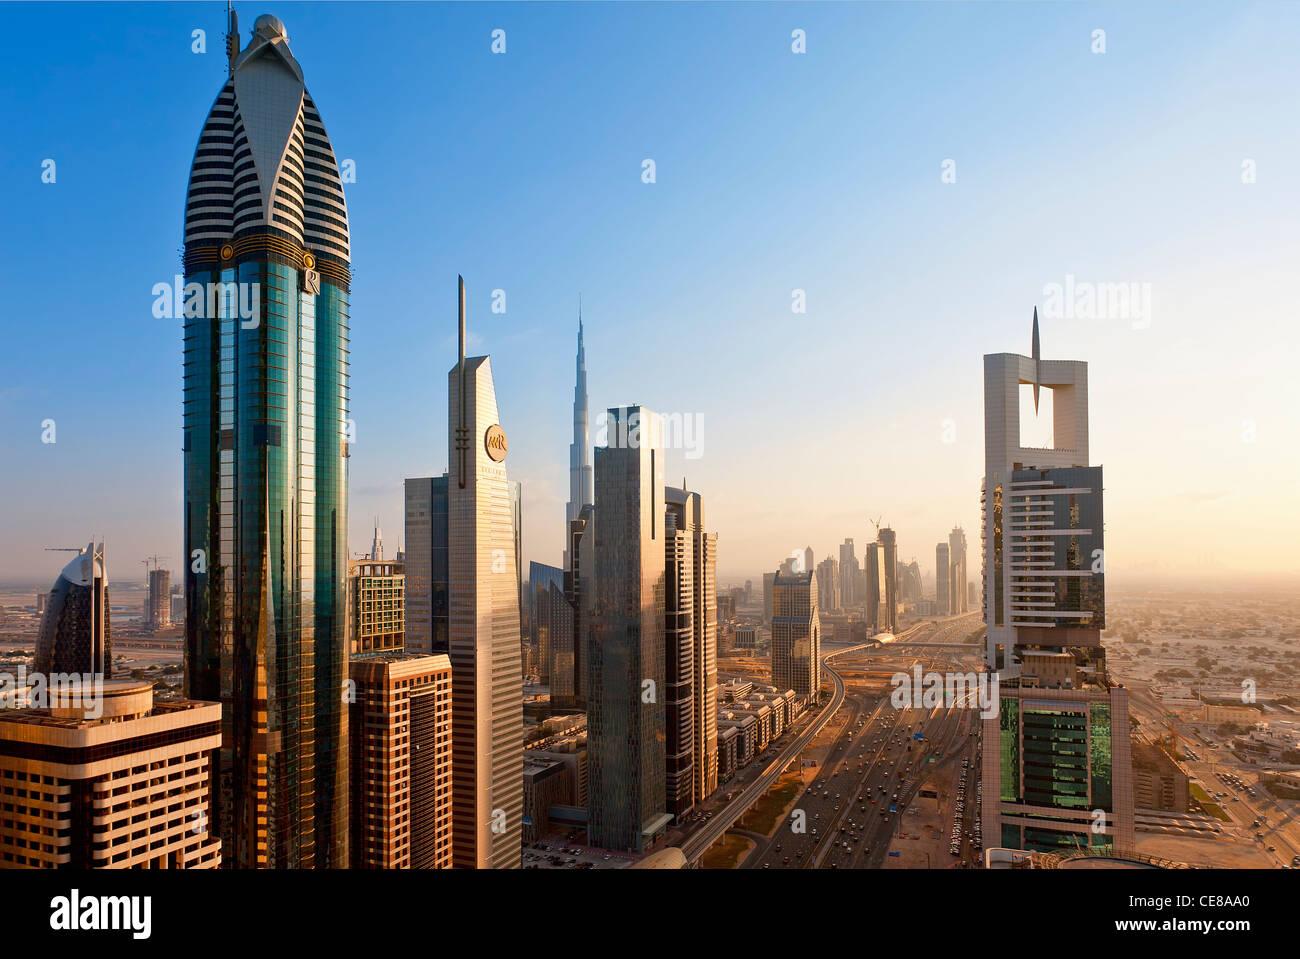 Dubai, Türmen Büro und Wohnung Türme entlang der Sheikh Zayed Road Stockbild